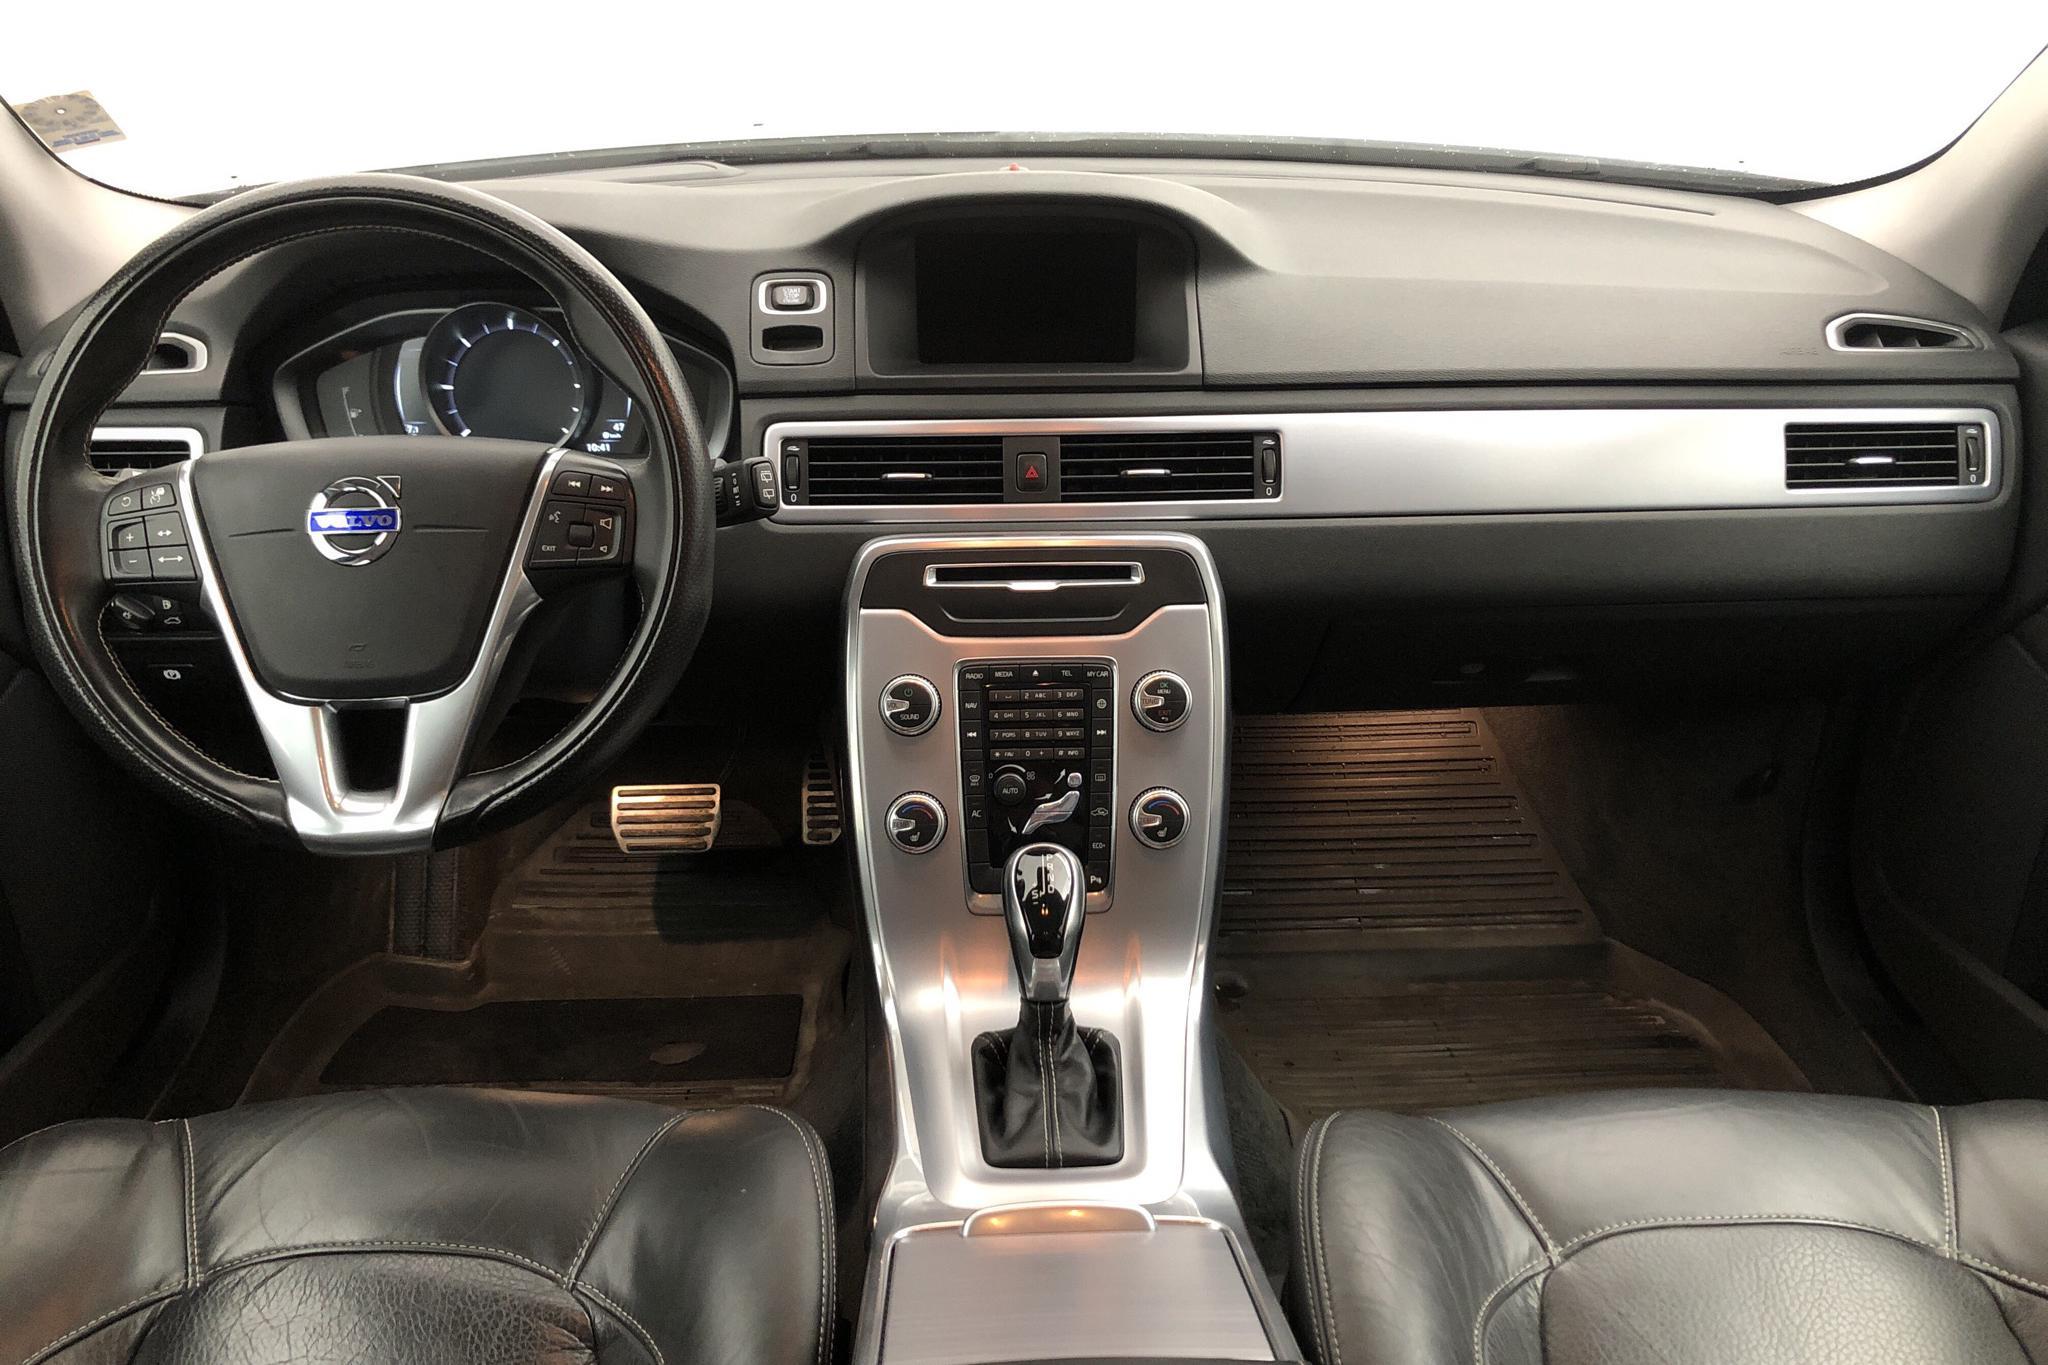 Volvo XC70 II D4 2WD (181hk) - 155 150 km - Automatic - white - 2016